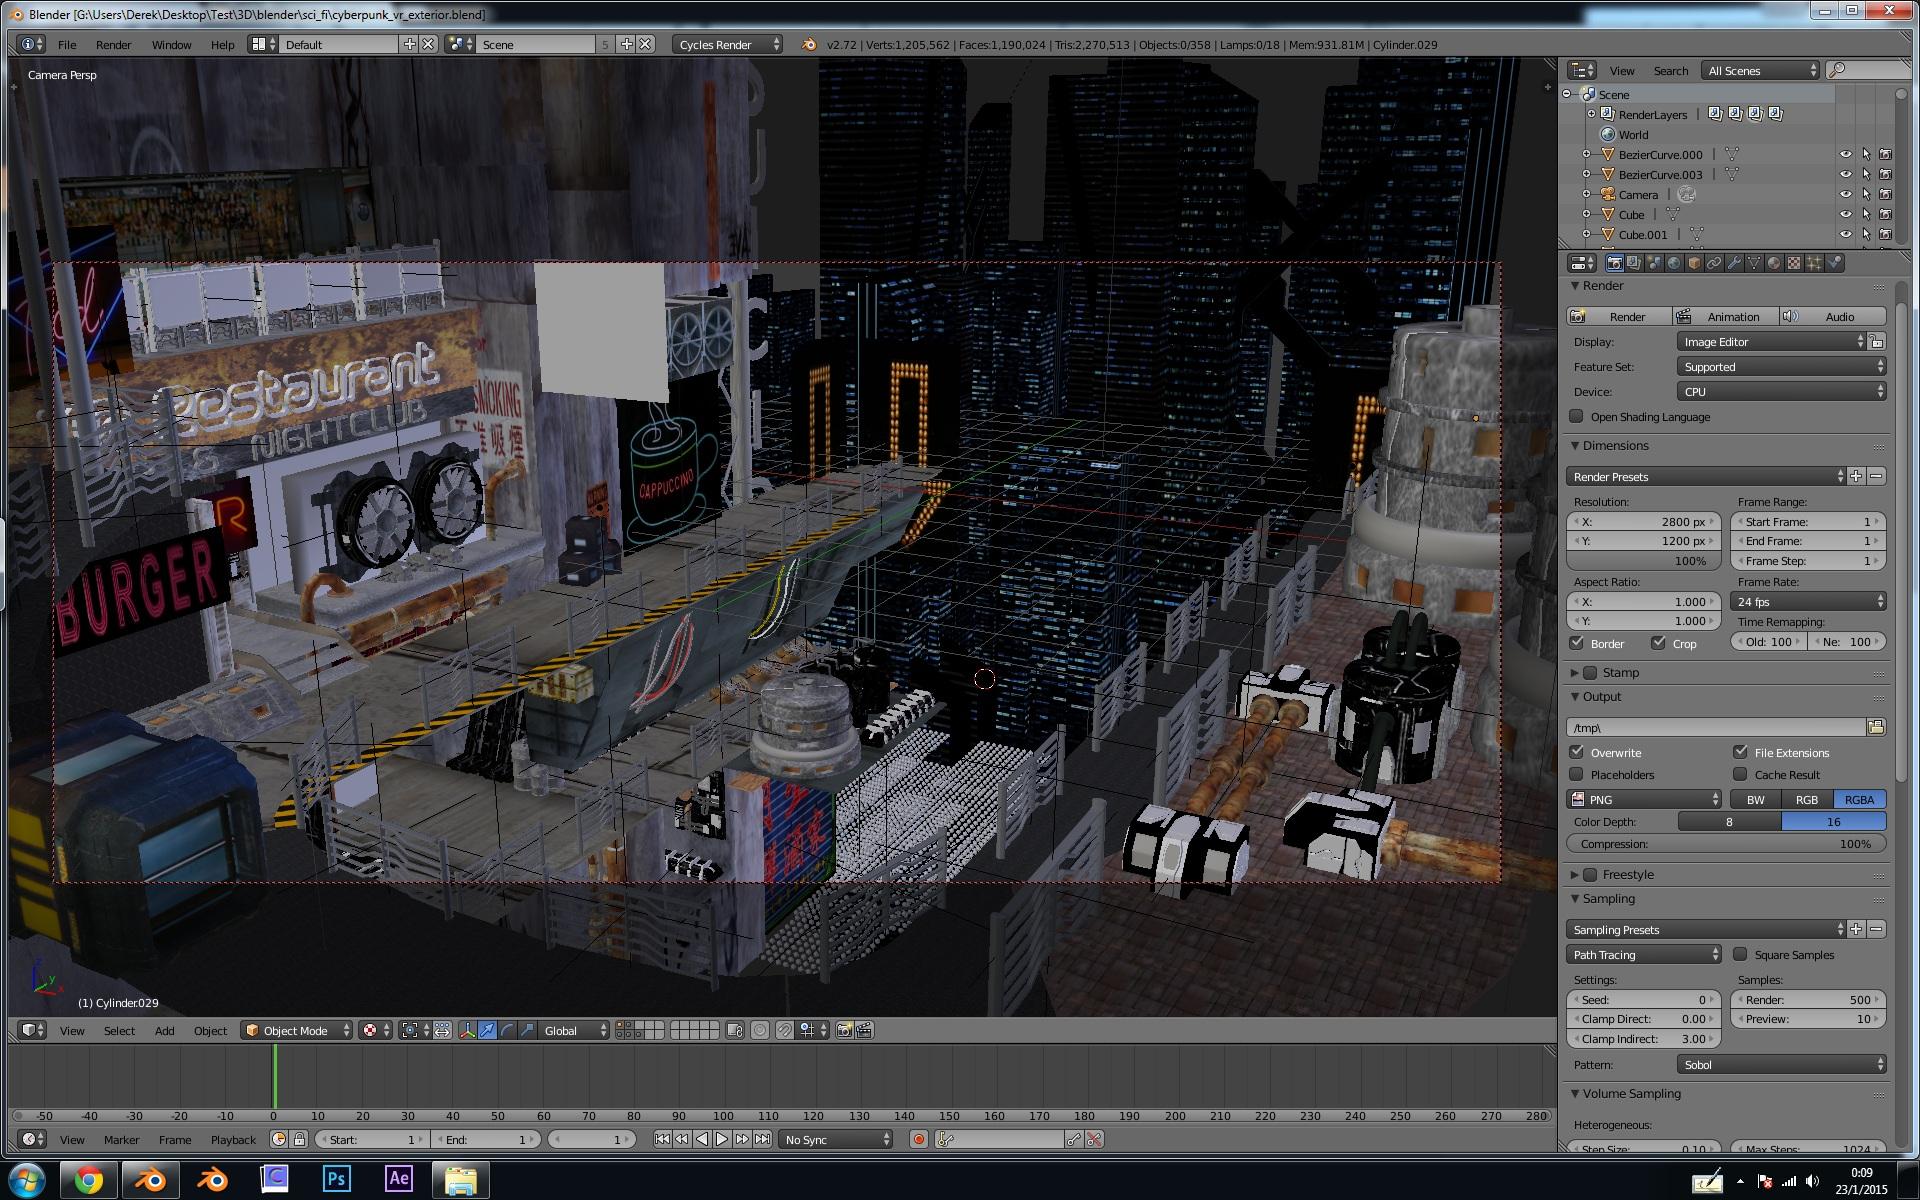 cyberpunk - night club - Finished Projects - Blender Artists Community